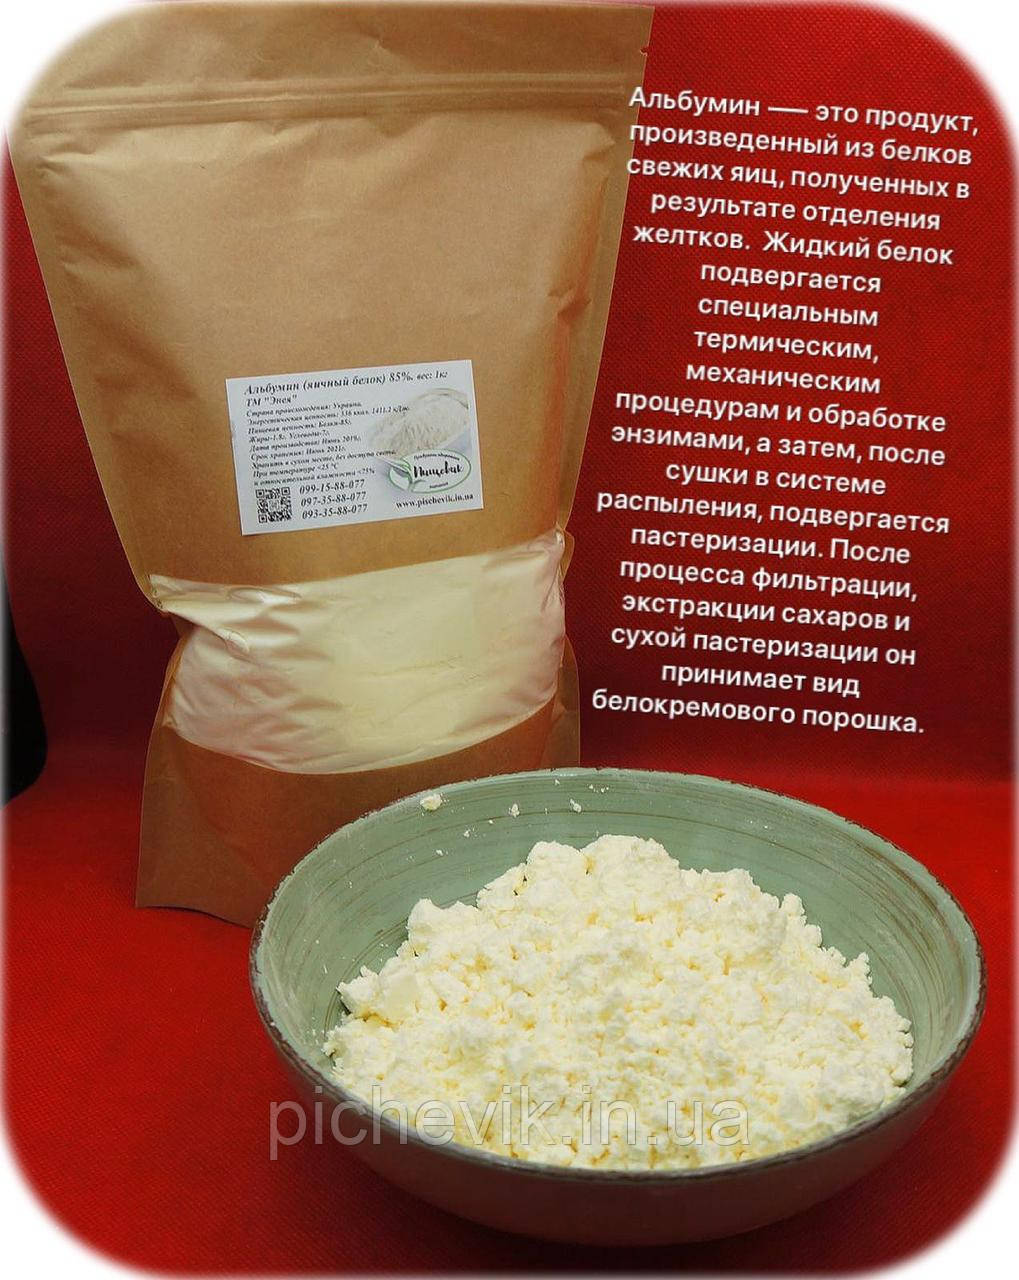 Альбумин 80% белка (яичный белок) (Украина) вес:1кг.